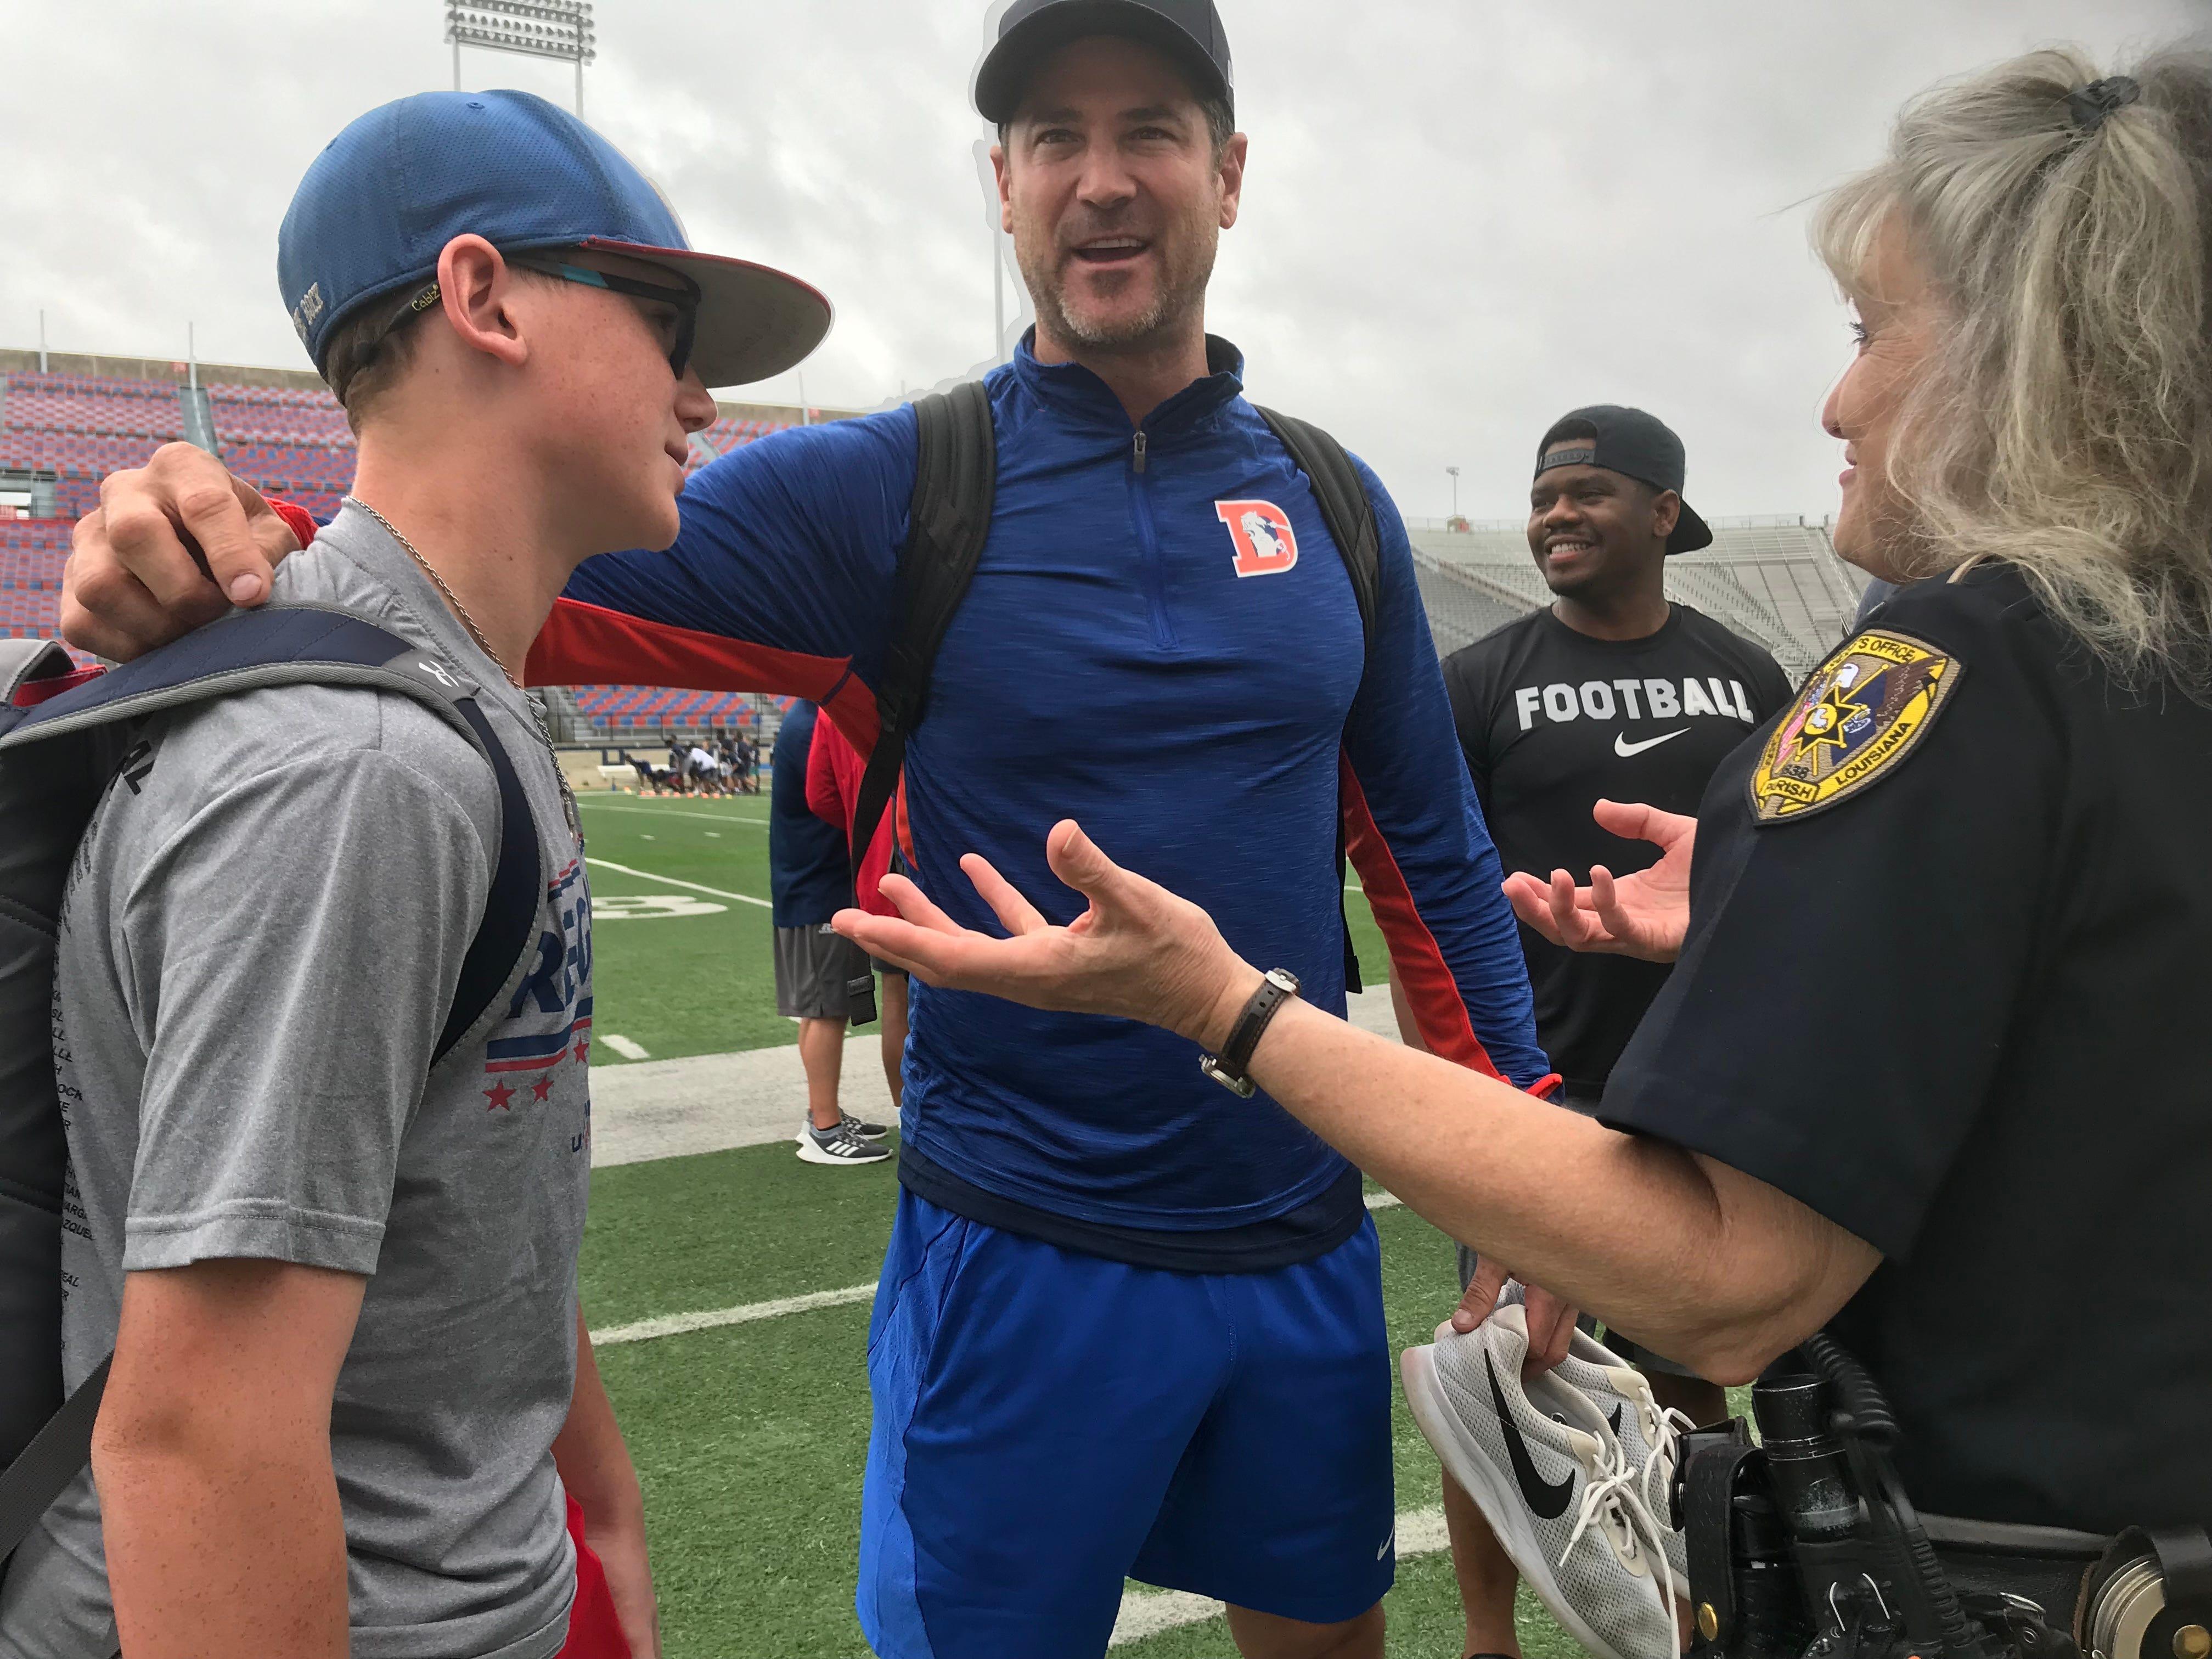 LSU's Josh Booty among attendees at Caddo DA's football camp